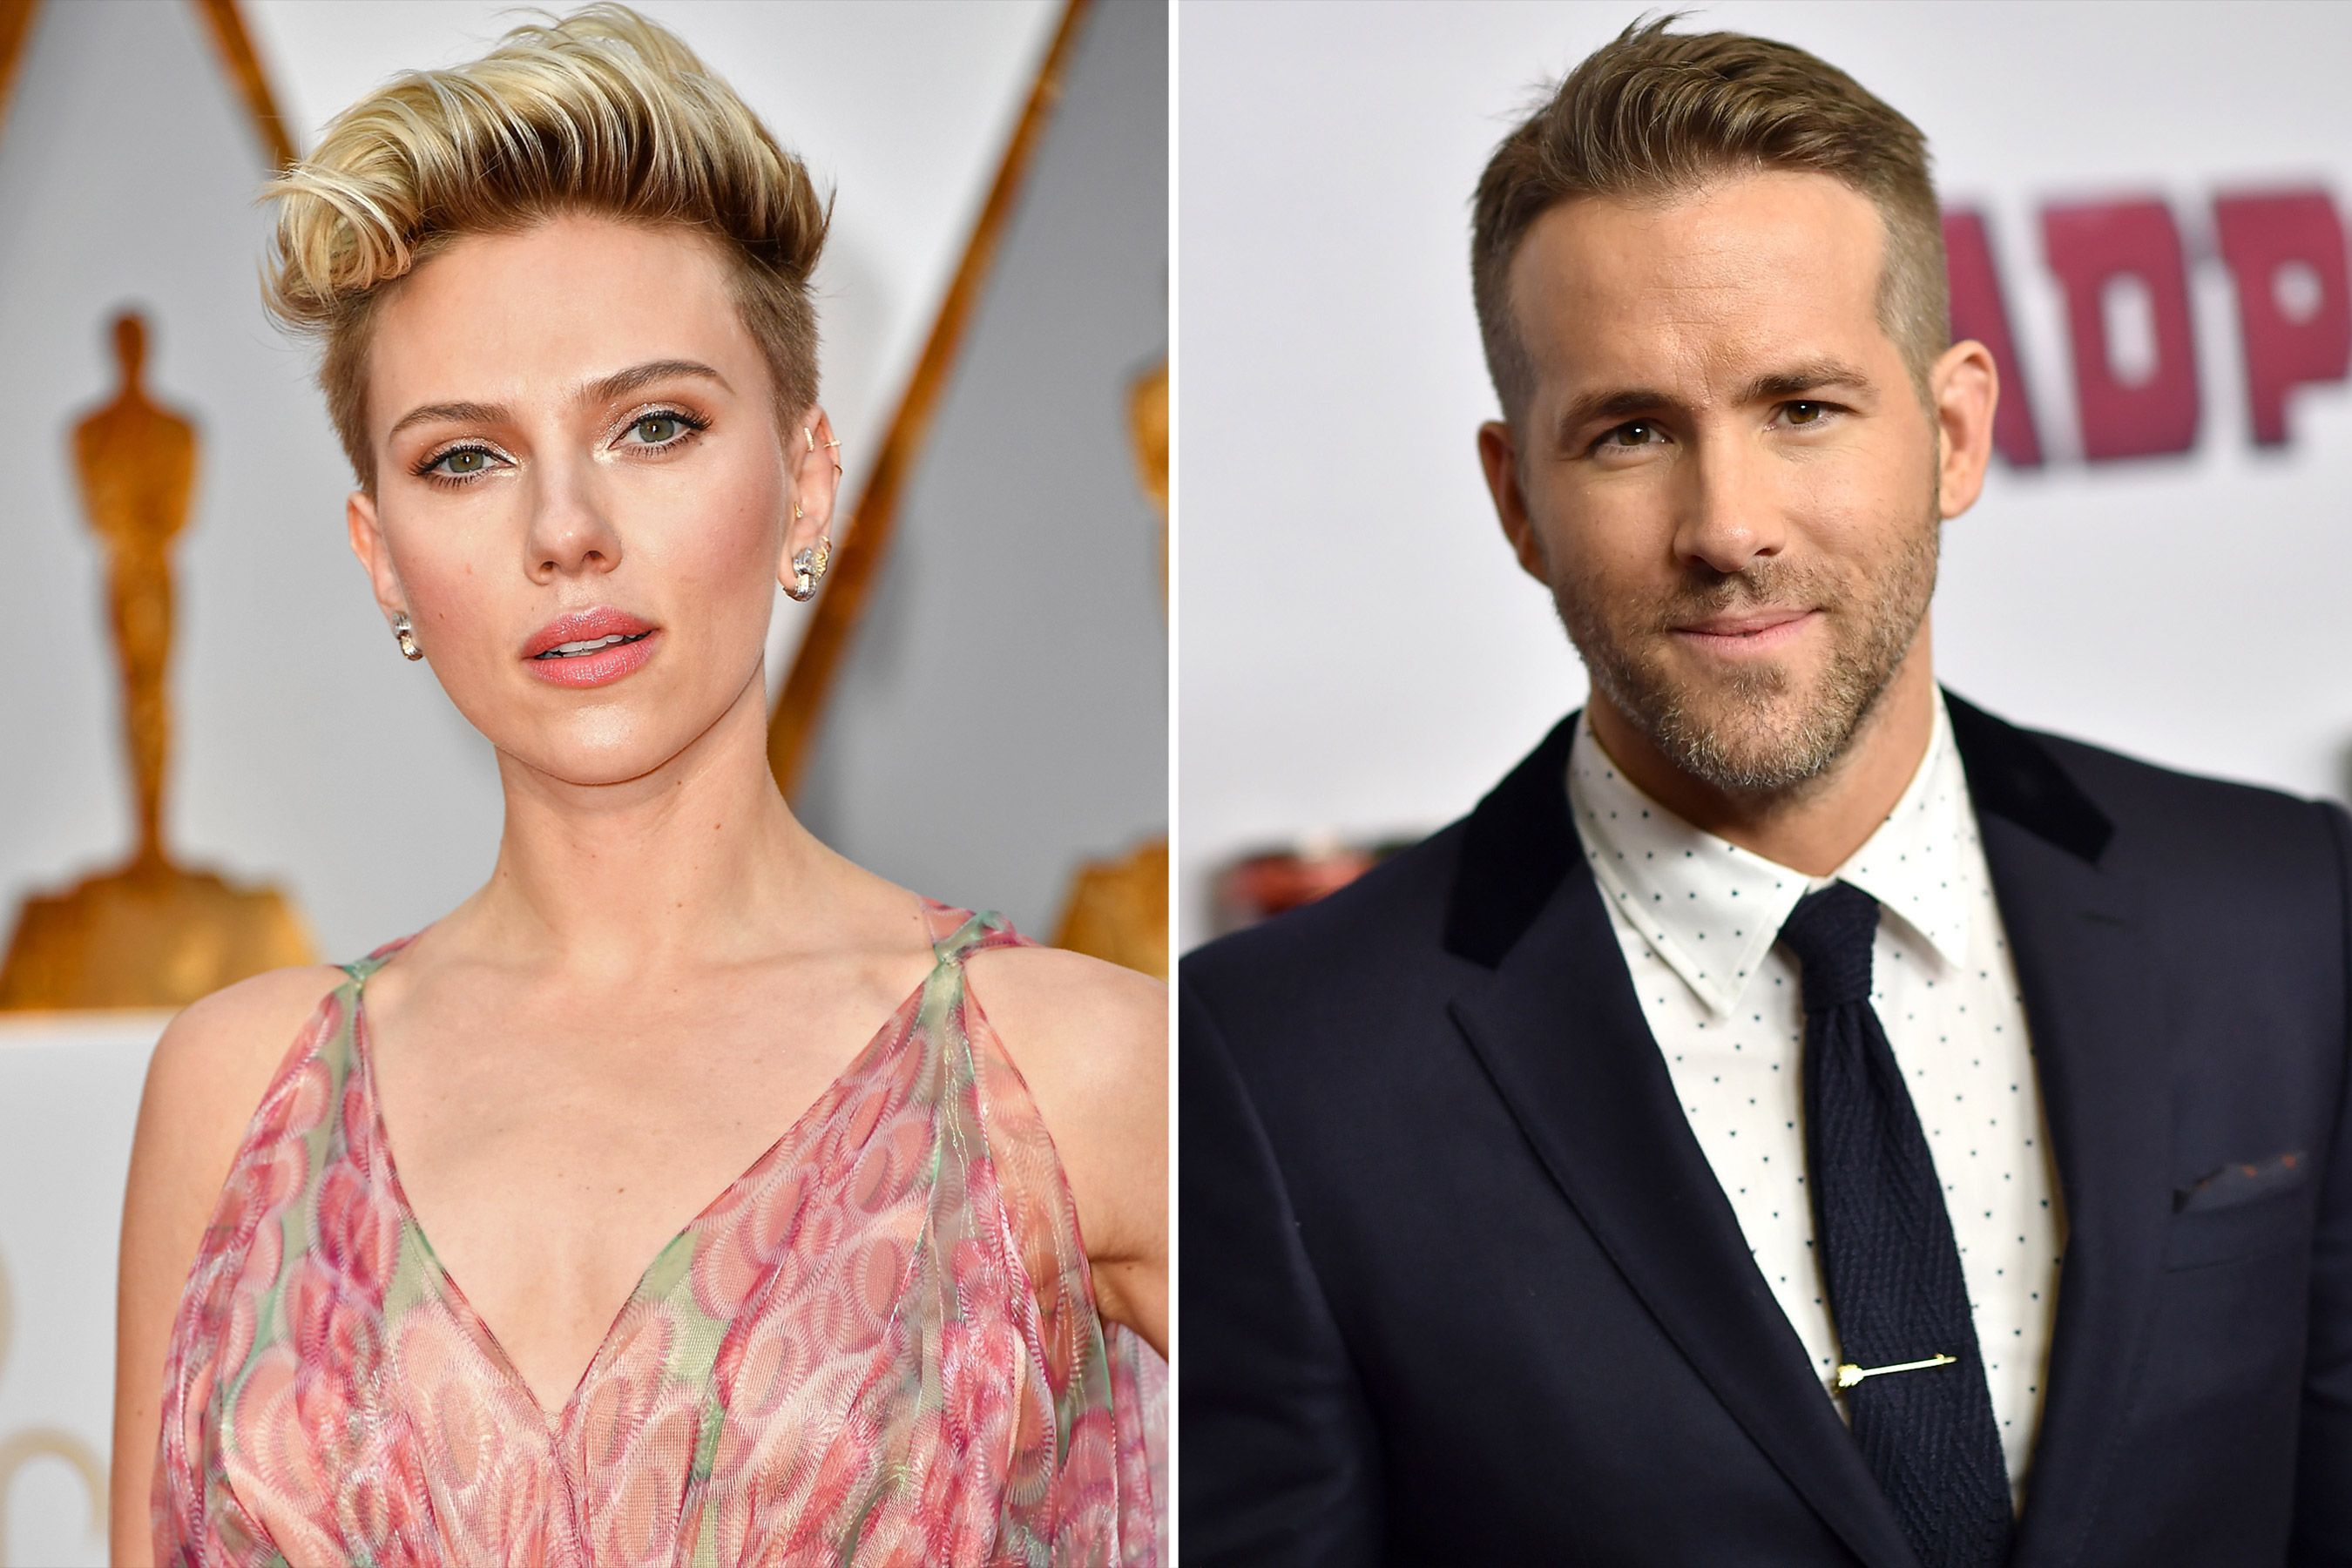 Scarlett Johansson Admits She Romanticized Marriage During Ryan Reynolds Relationship Scarlett Johansson Ryan Reynolds Scarlett